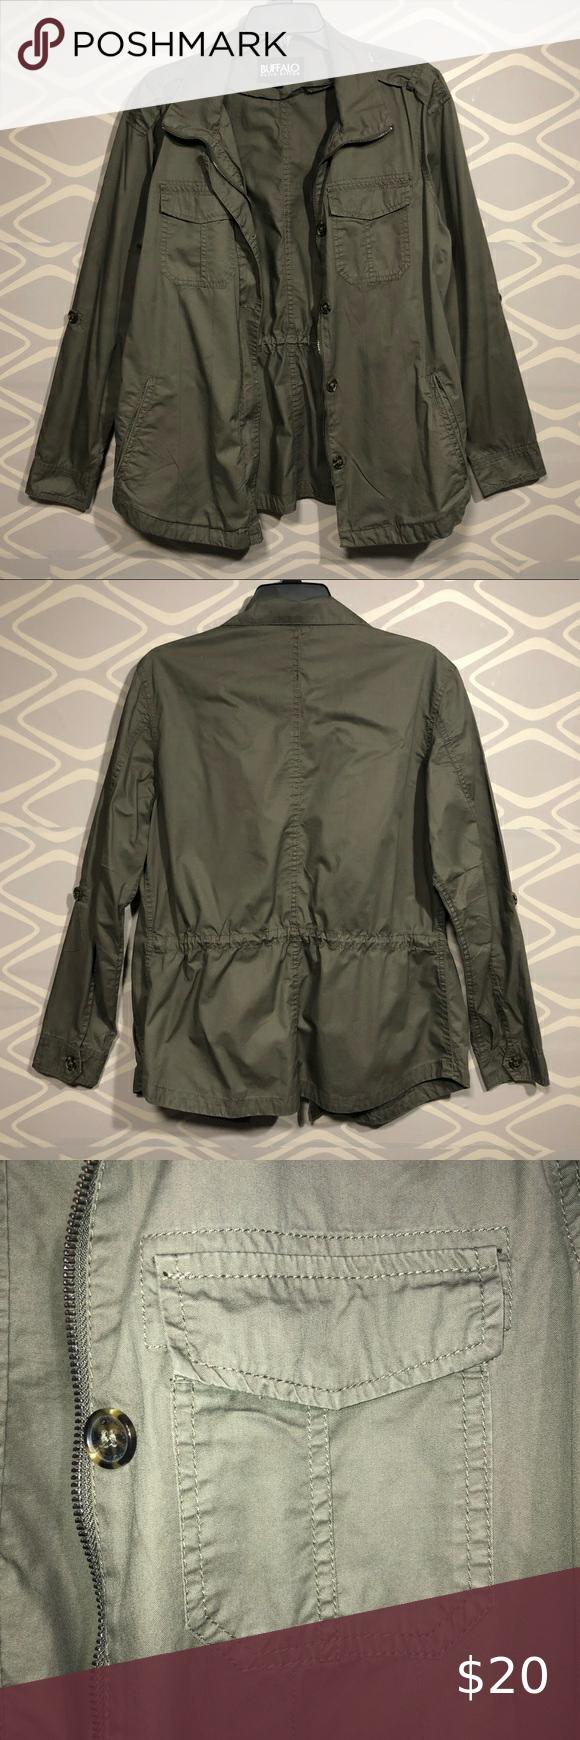 Buffalo David Bitton Utility Jacket Utility Jacket Olive Utility Jacket Jackets [ 1740 x 580 Pixel ]